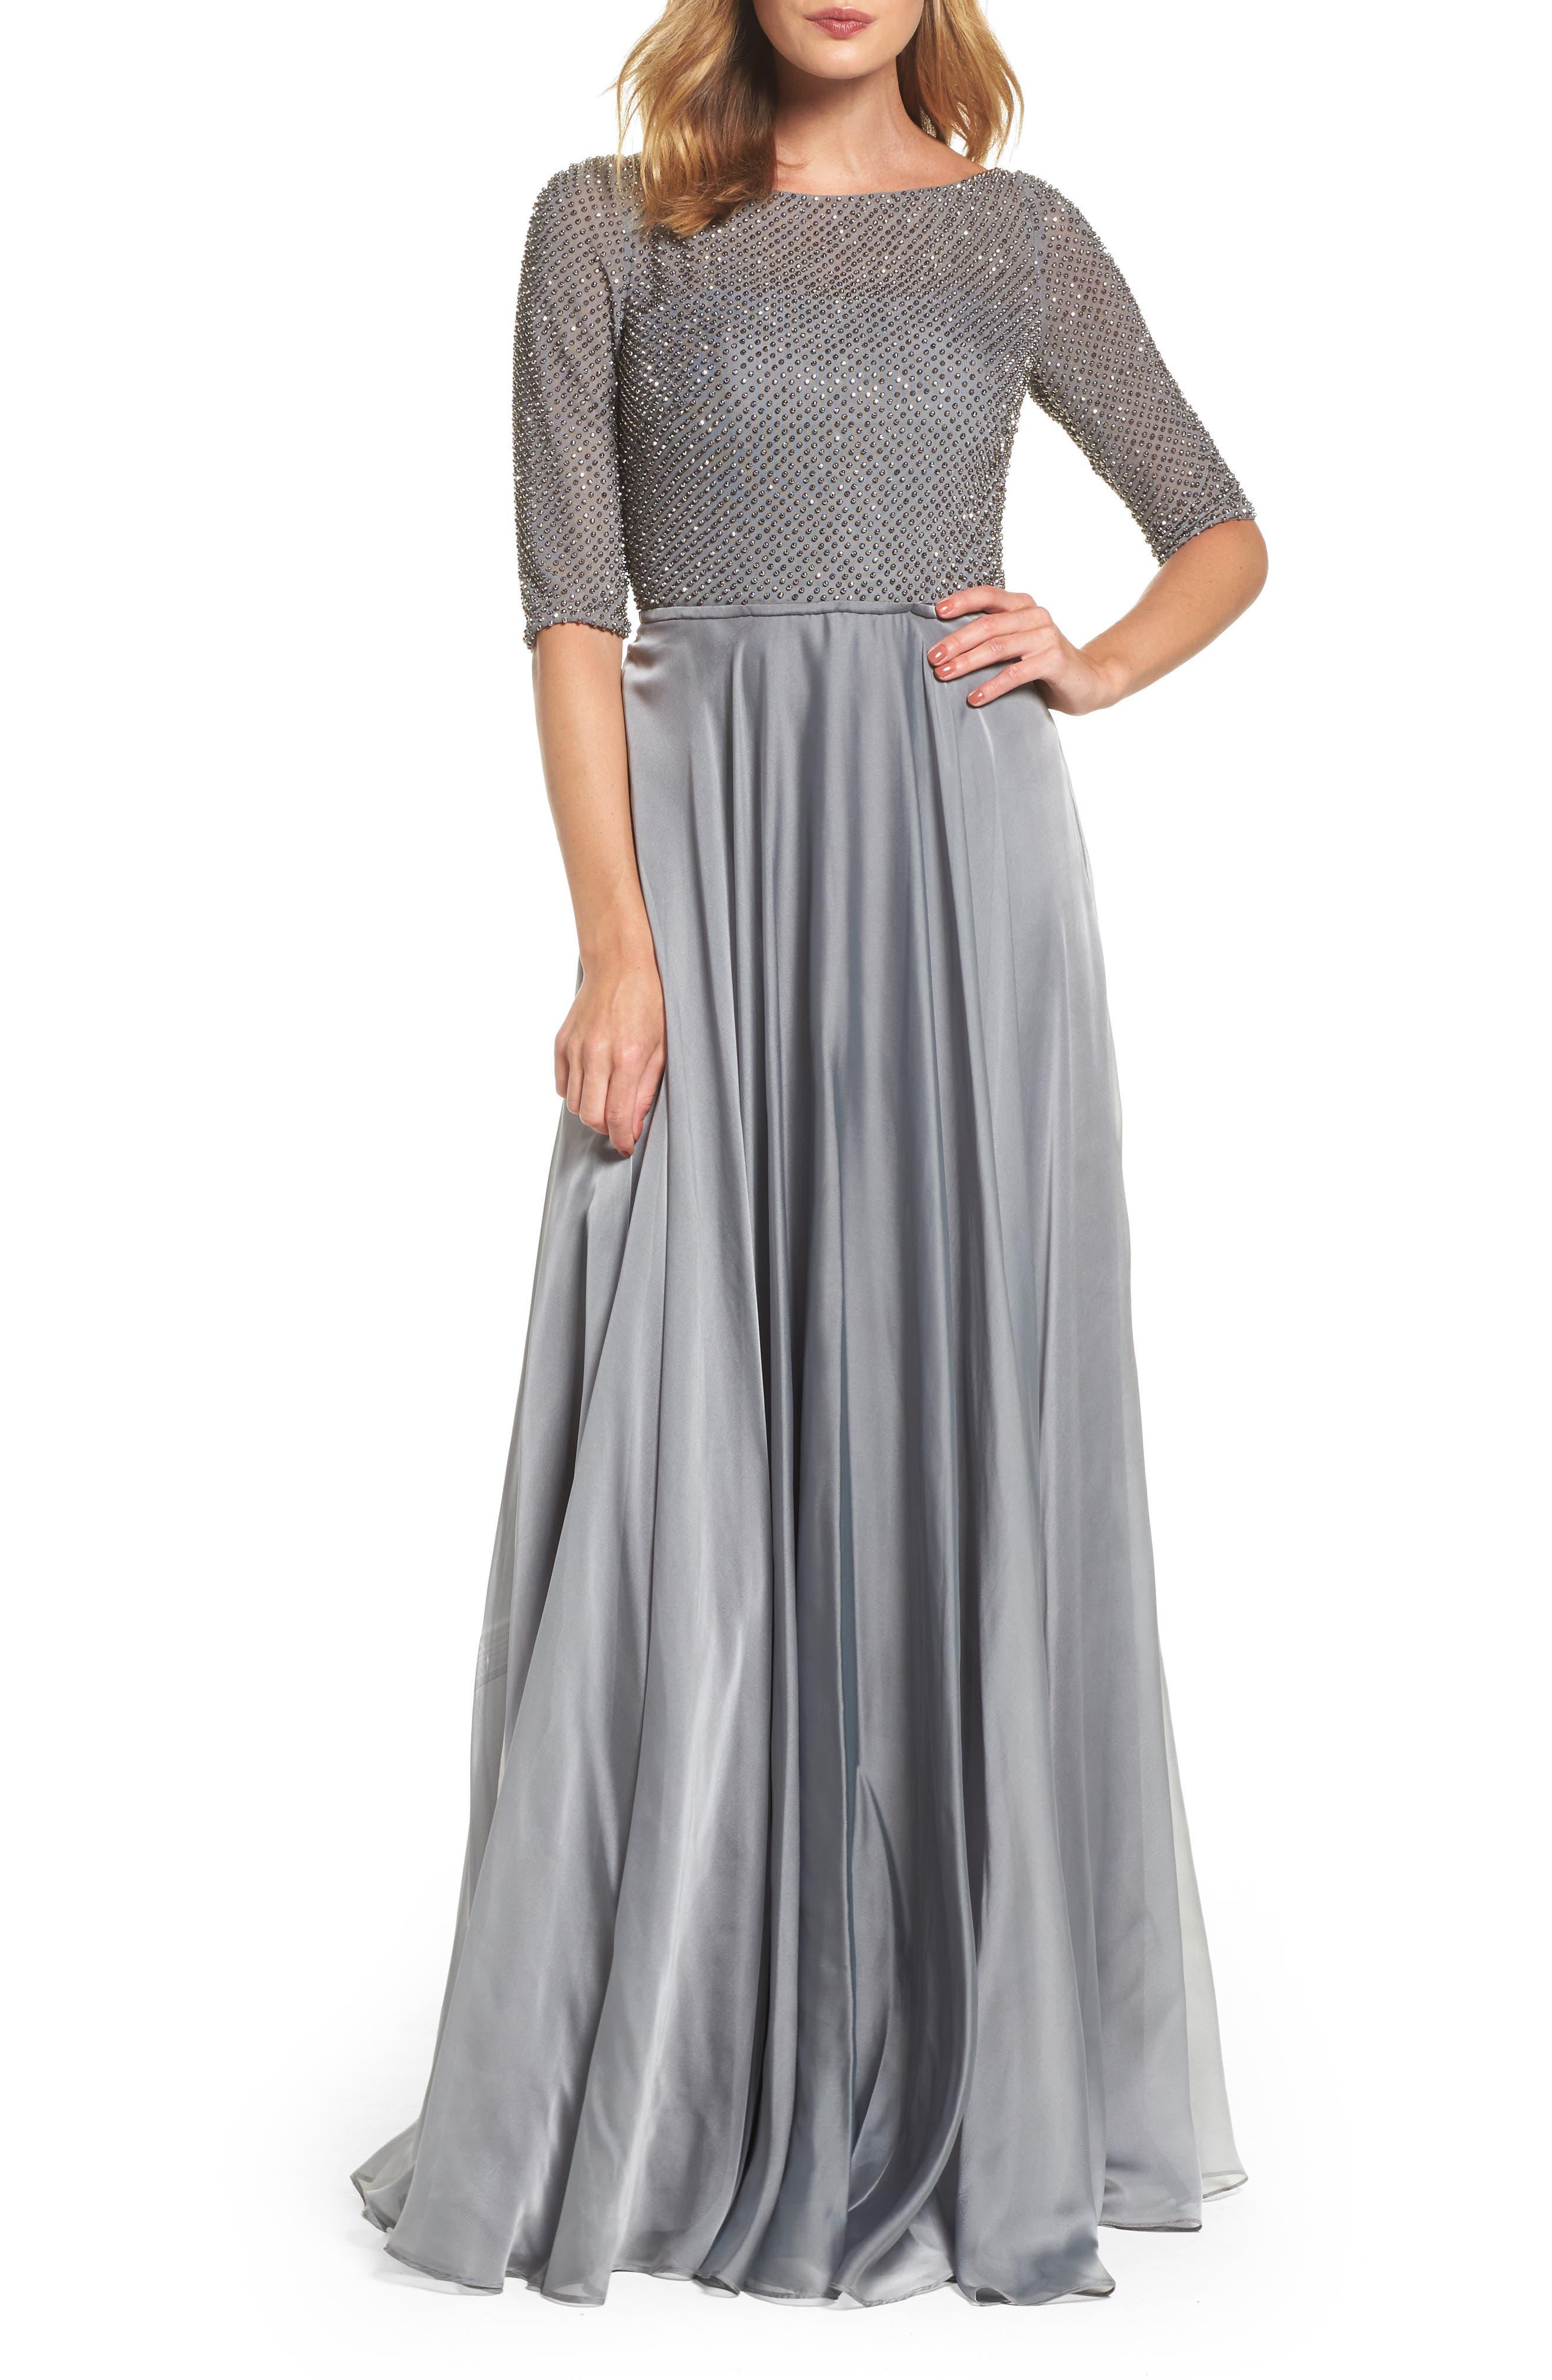 LA FEMME, Embellished Bodice Gown, Main thumbnail 1, color, PLATINUM